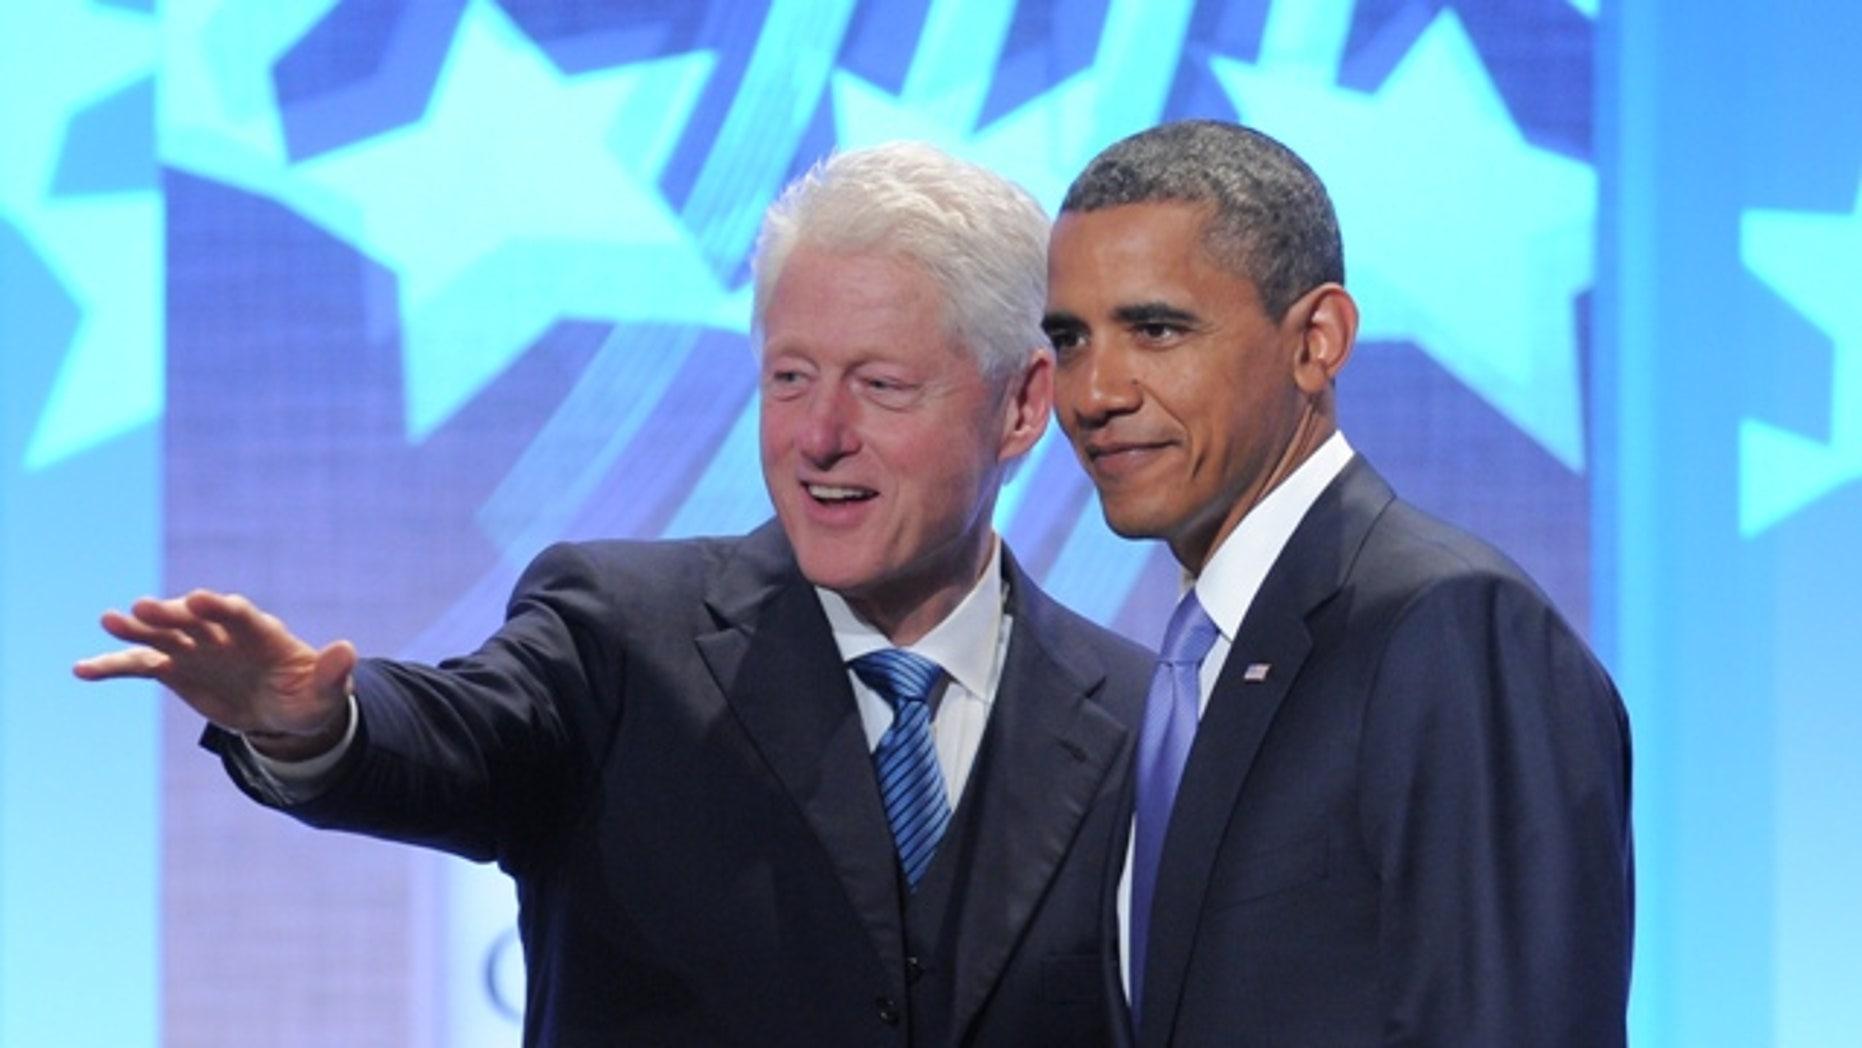 Former President Bill Clinton with President Barack Obama in New York Sept. 23, 2010 (AP)